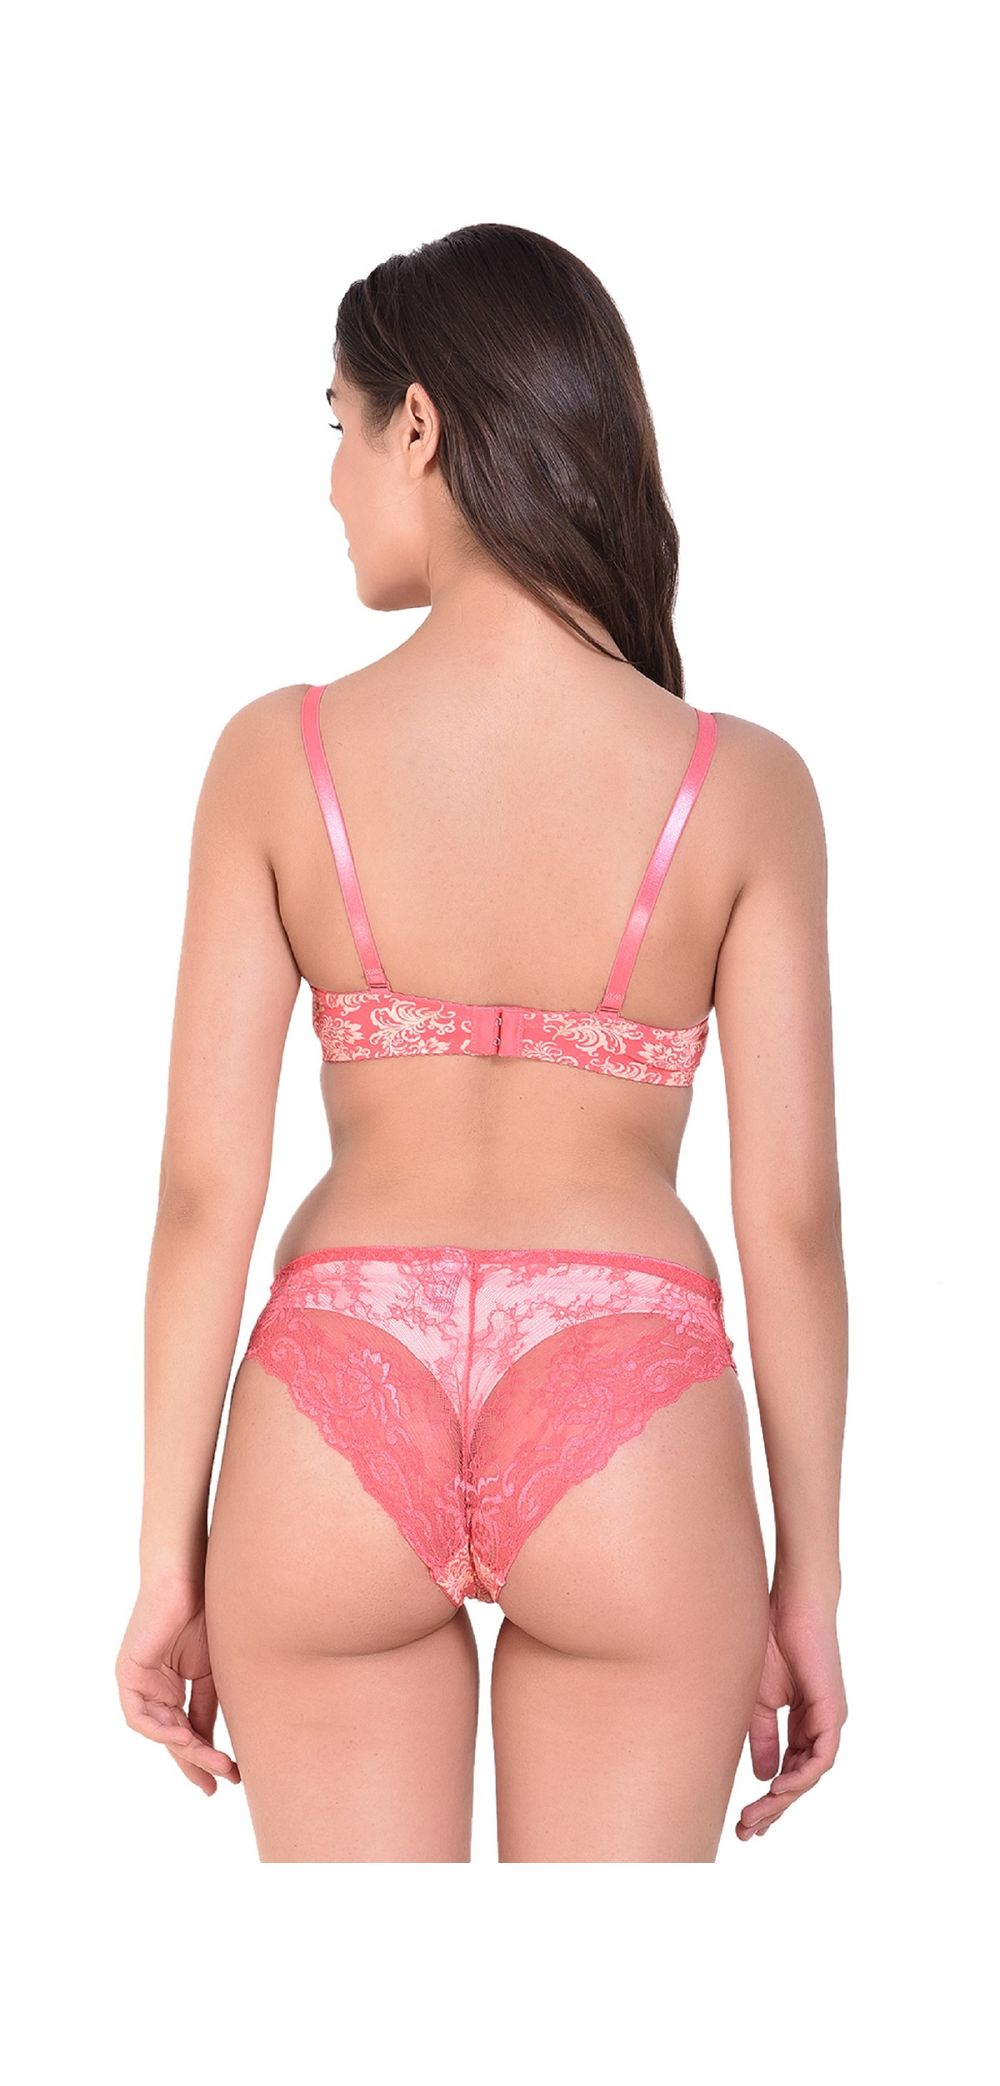 63575f3e1f Angels Aura Women's Double Push Up Bra and Bikini Set, Color- PEACH